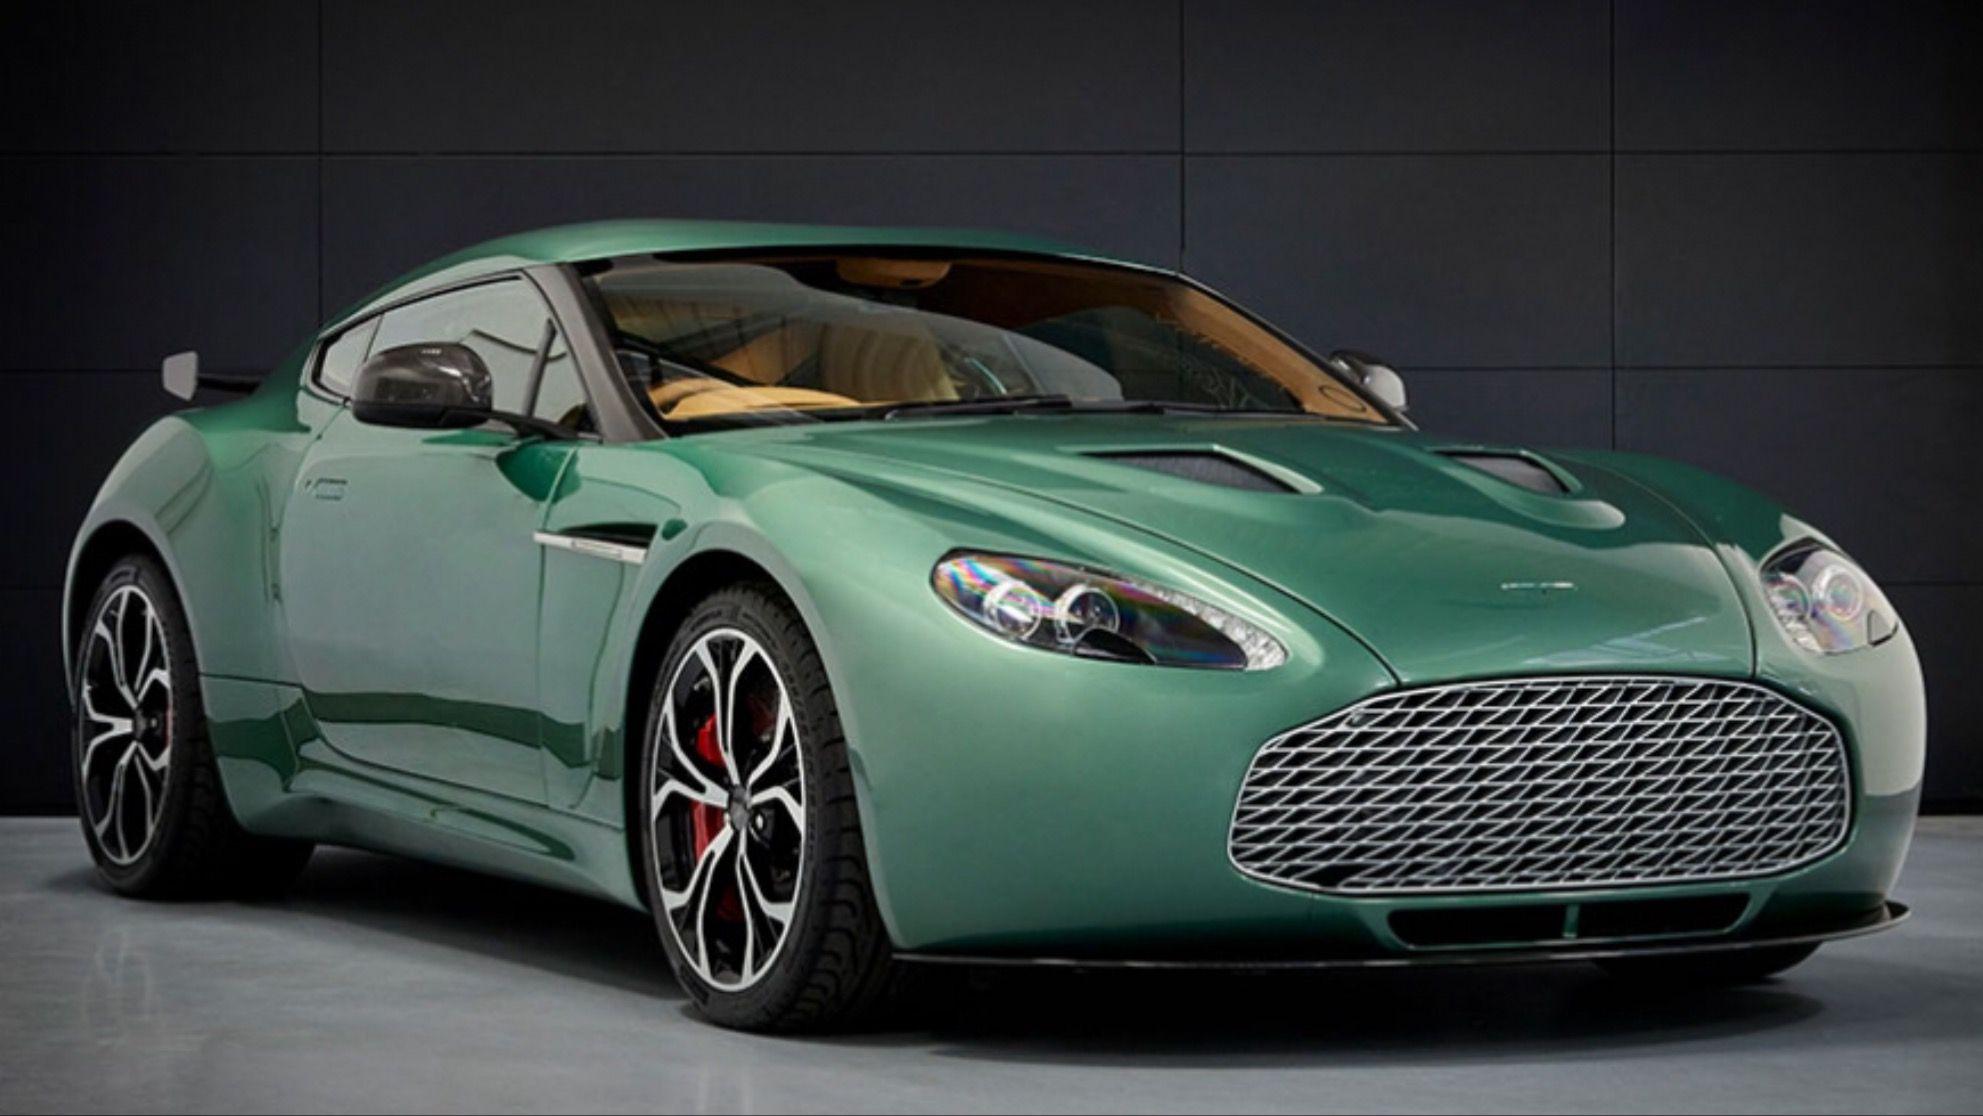 Aston Martin Works Pre Production V12 Vantage Zagato Rebuild After Aston Martin Aston Martin Lagonda Aston